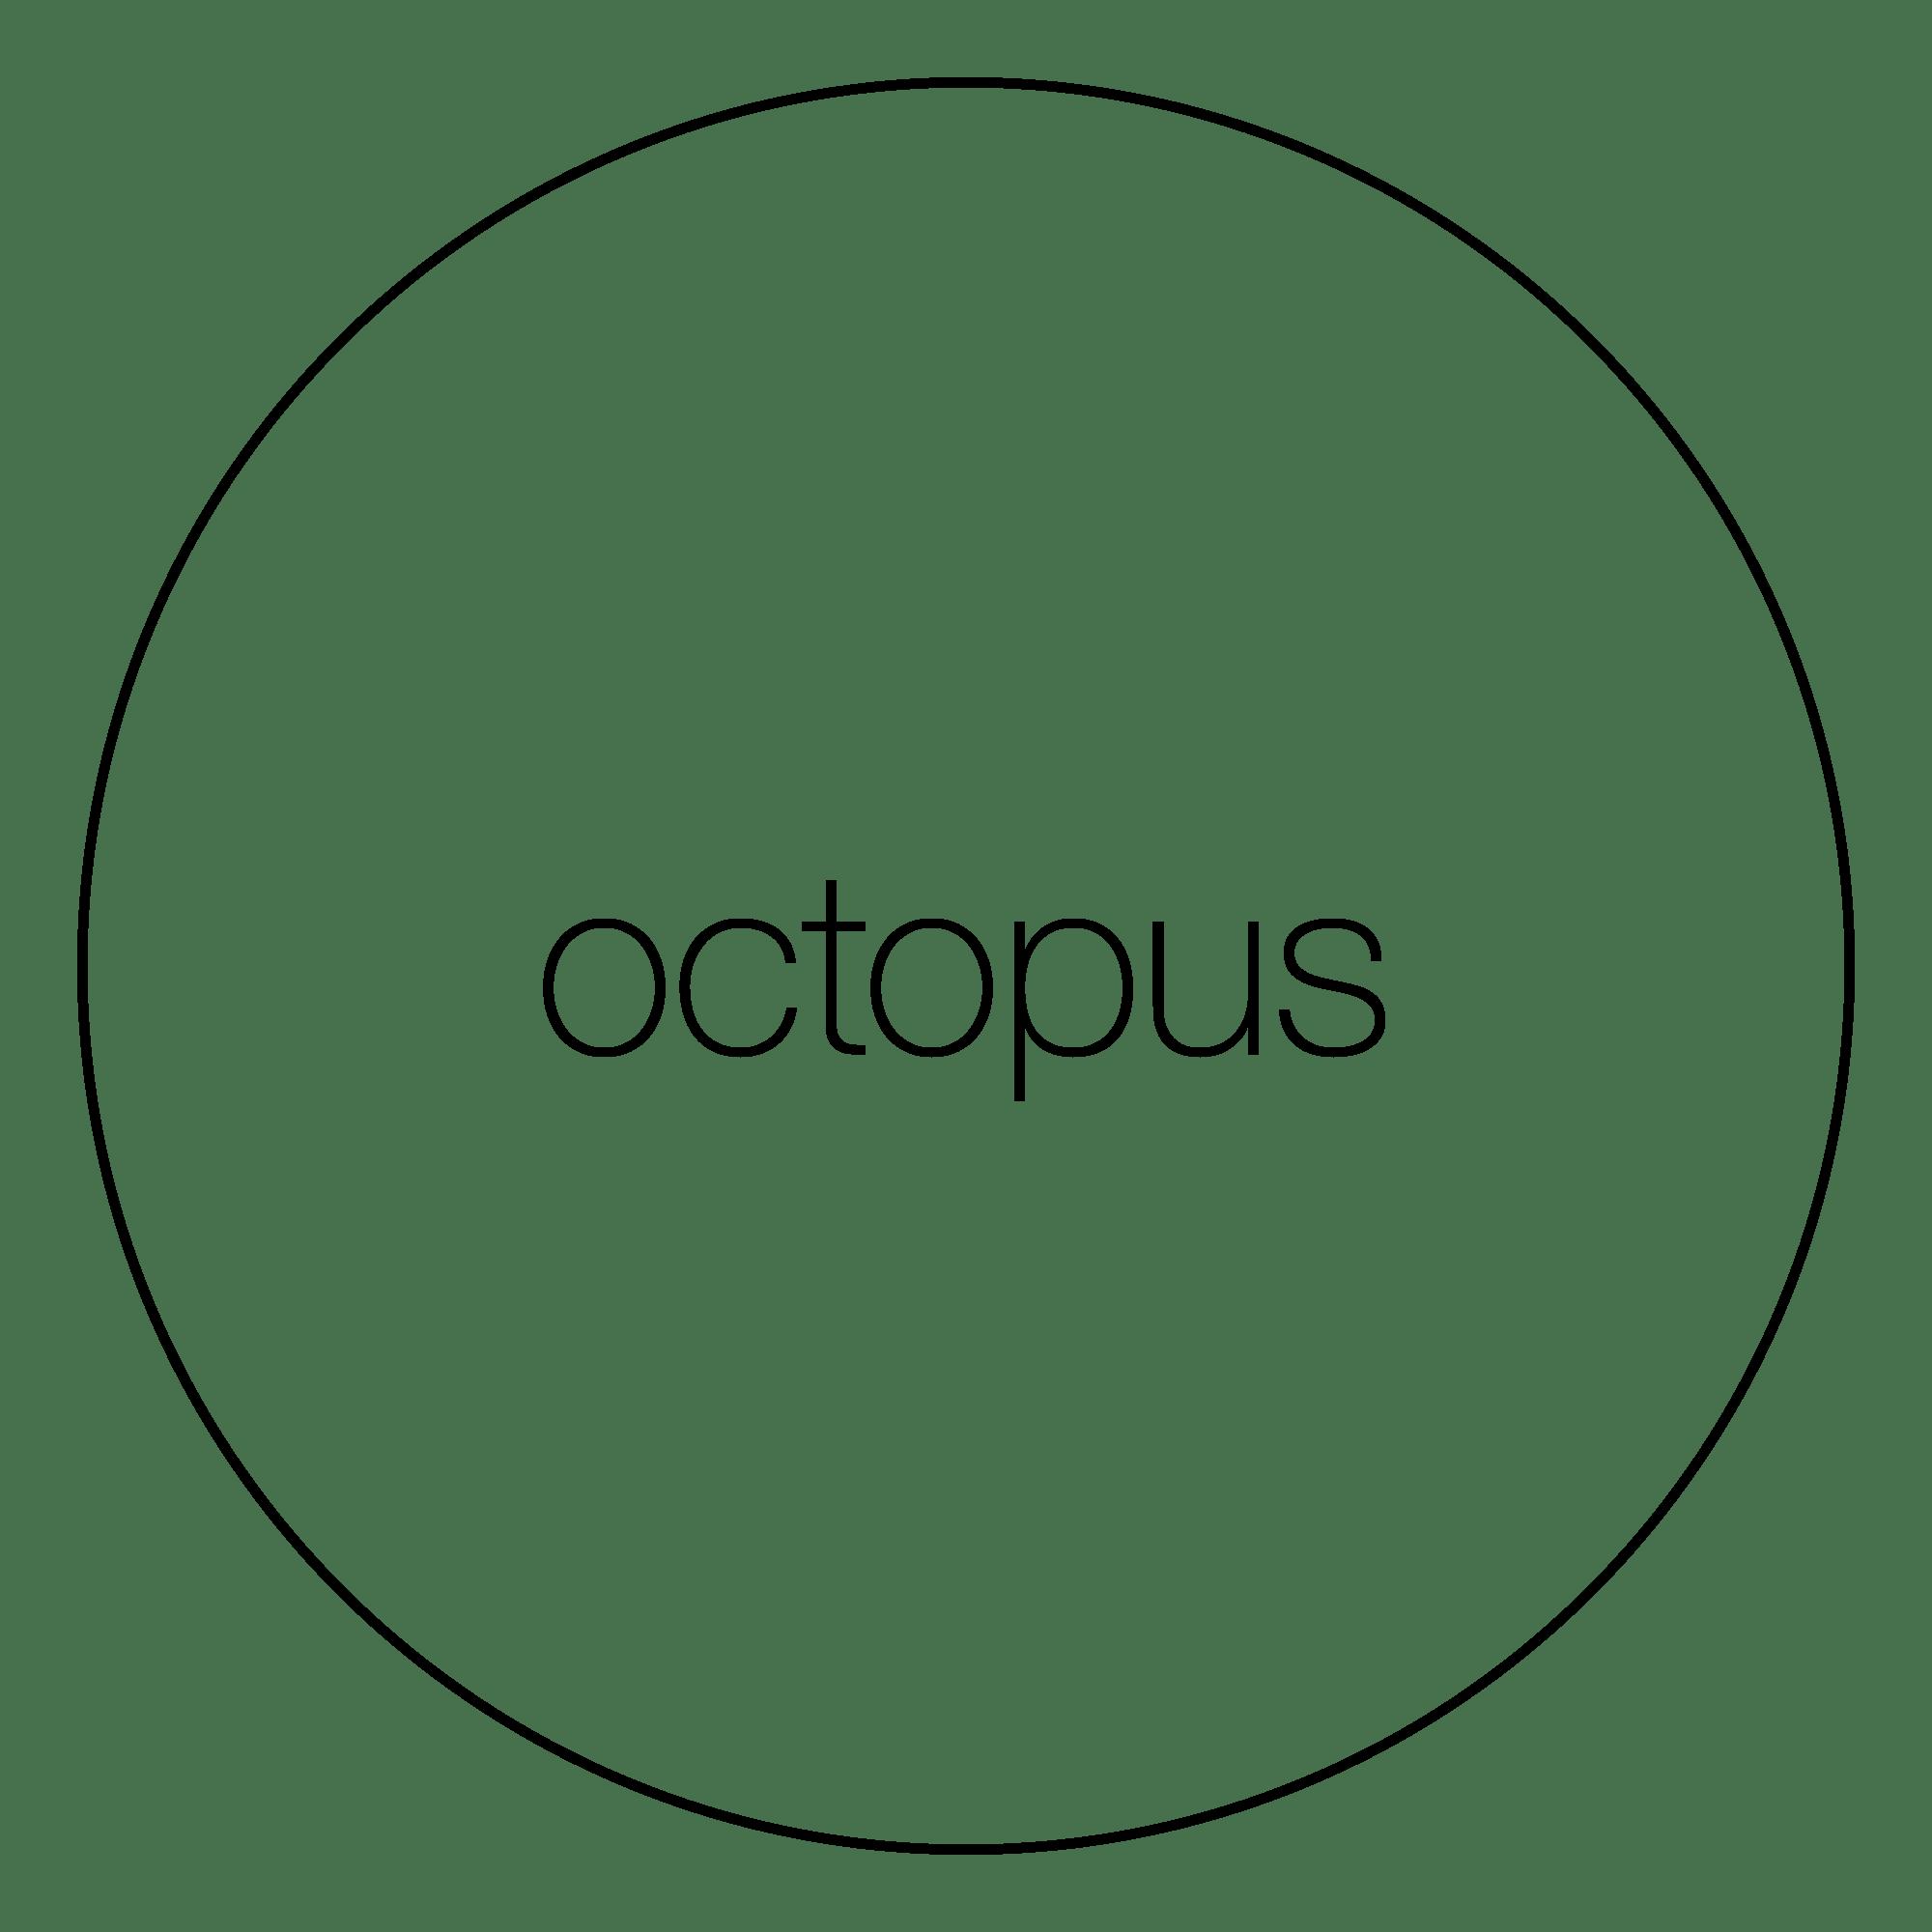 attribute-motif-octopus